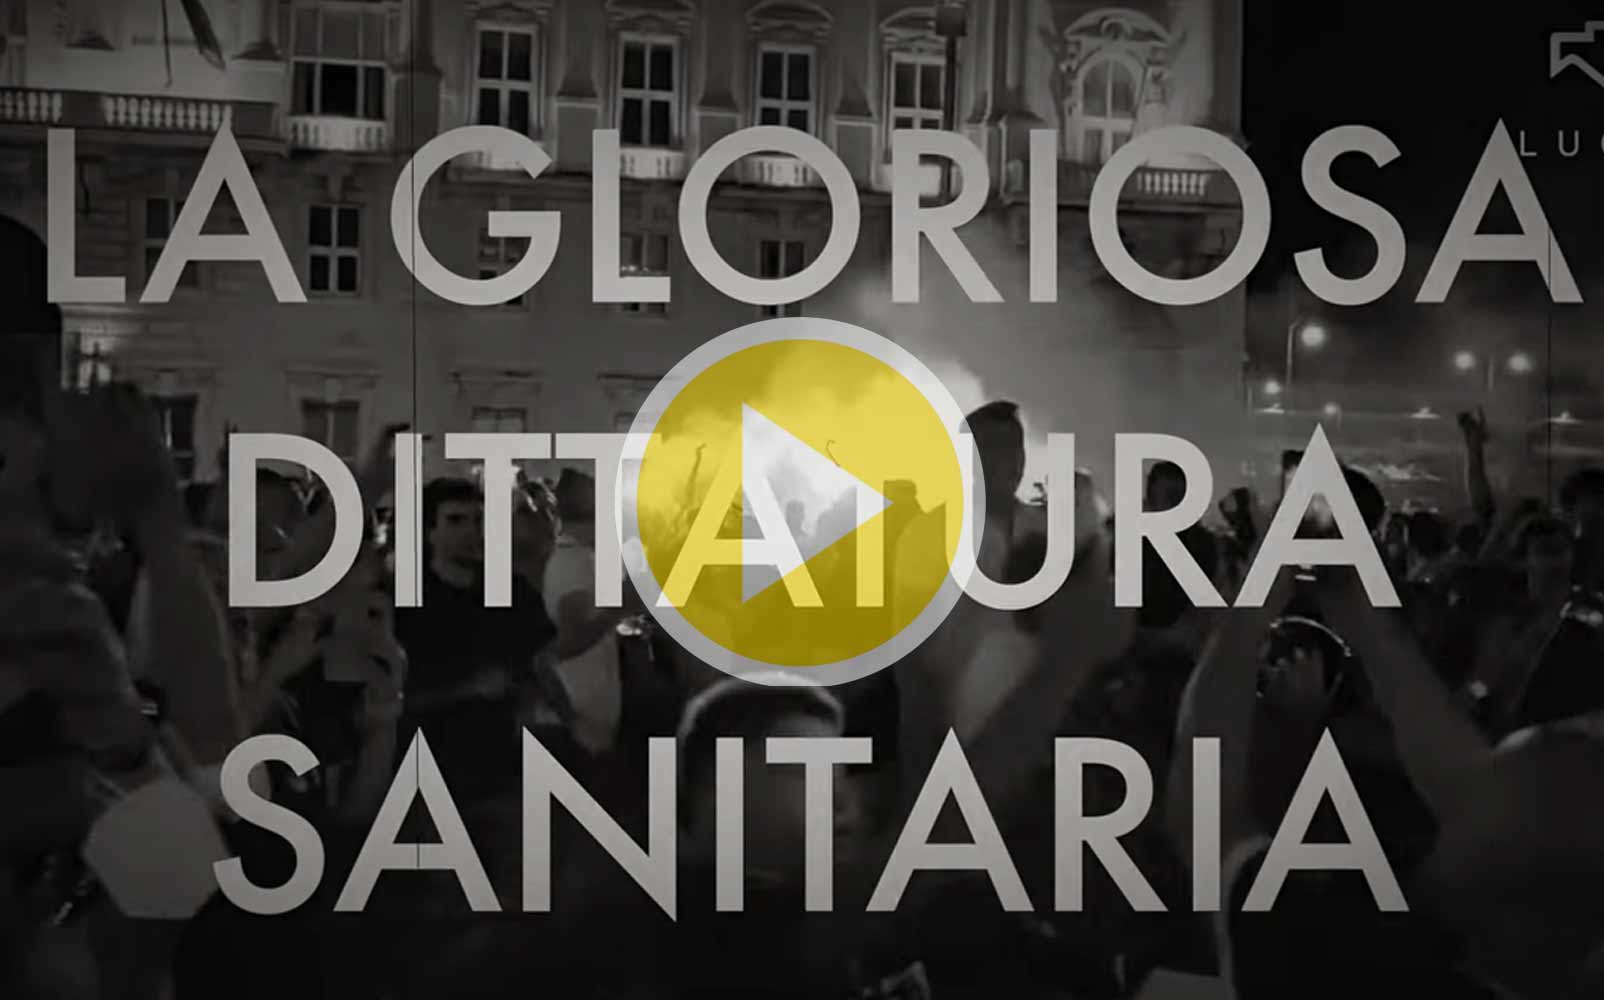 VIDEO La Gloriosa Dittatura Sanitaria